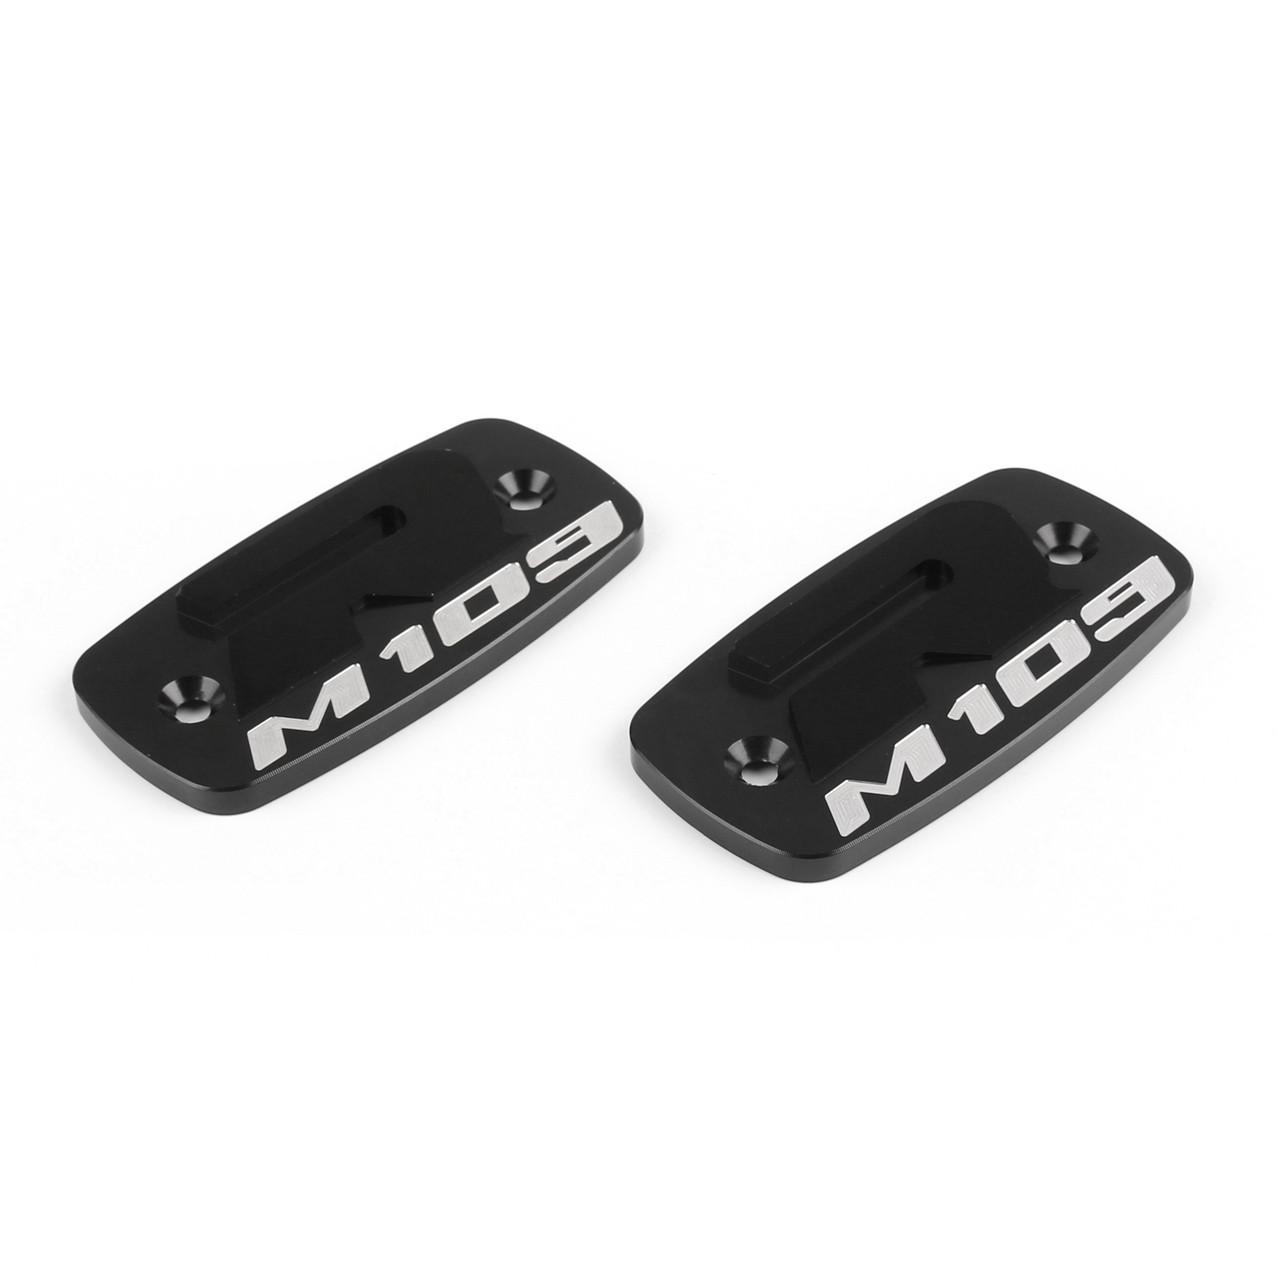 http://www.madhornets.store/AMZ/MotoPart/RC%20SERIES/RC-095/RC-095-Black-1.jpg